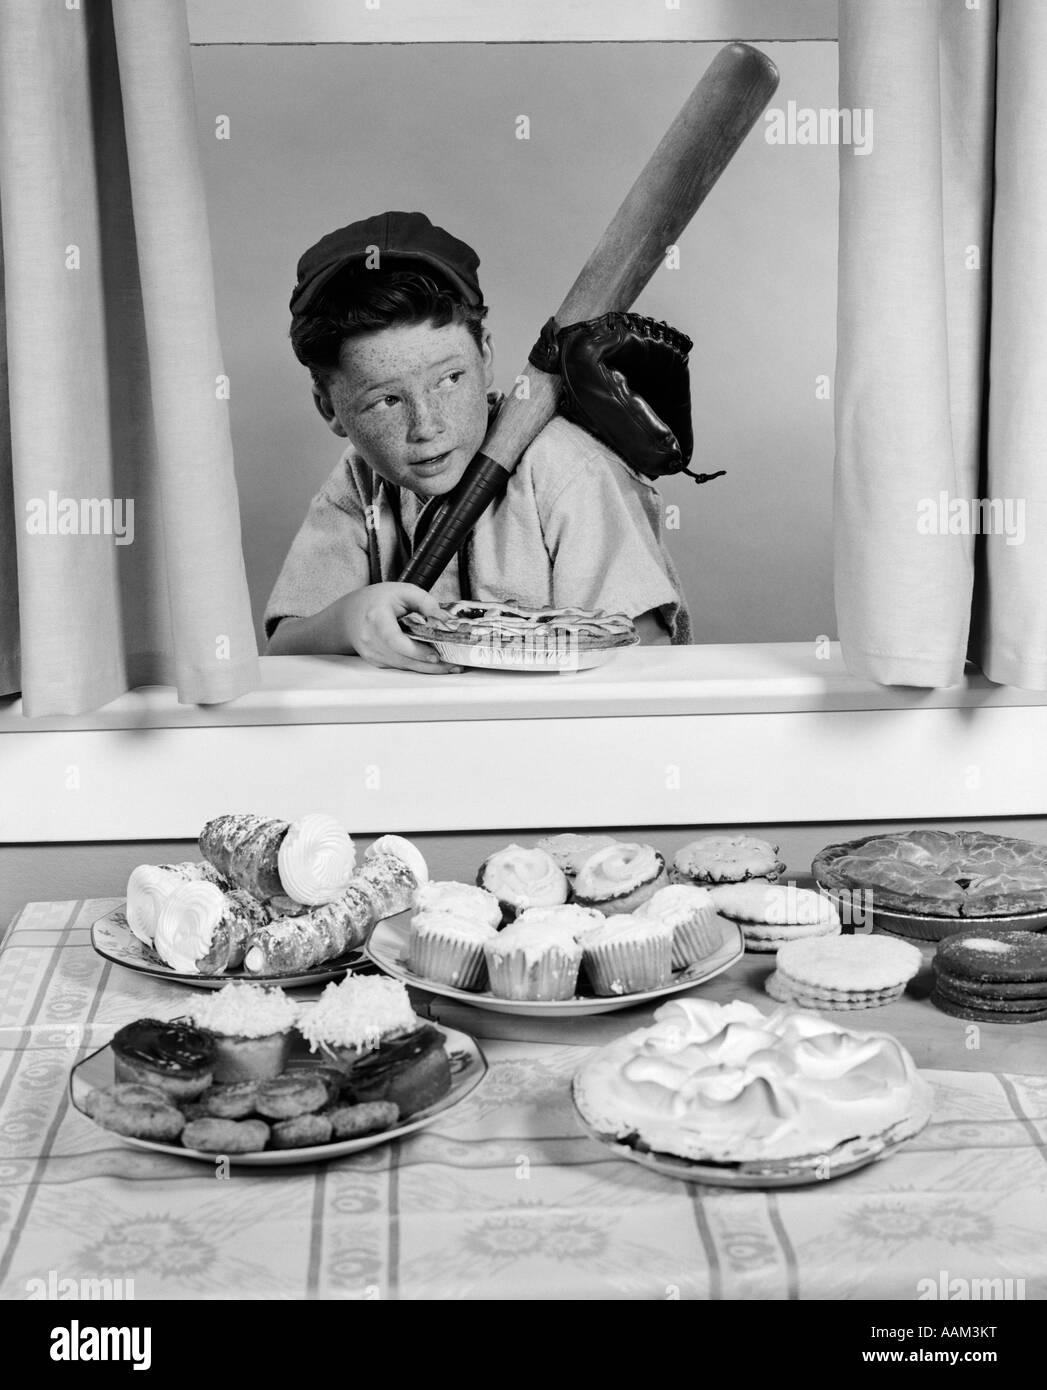 1950s BOY IN BASEBALL GARB WITH BAT SNEAKING PIE THROUGH OPEN WINDOW Stock Photo